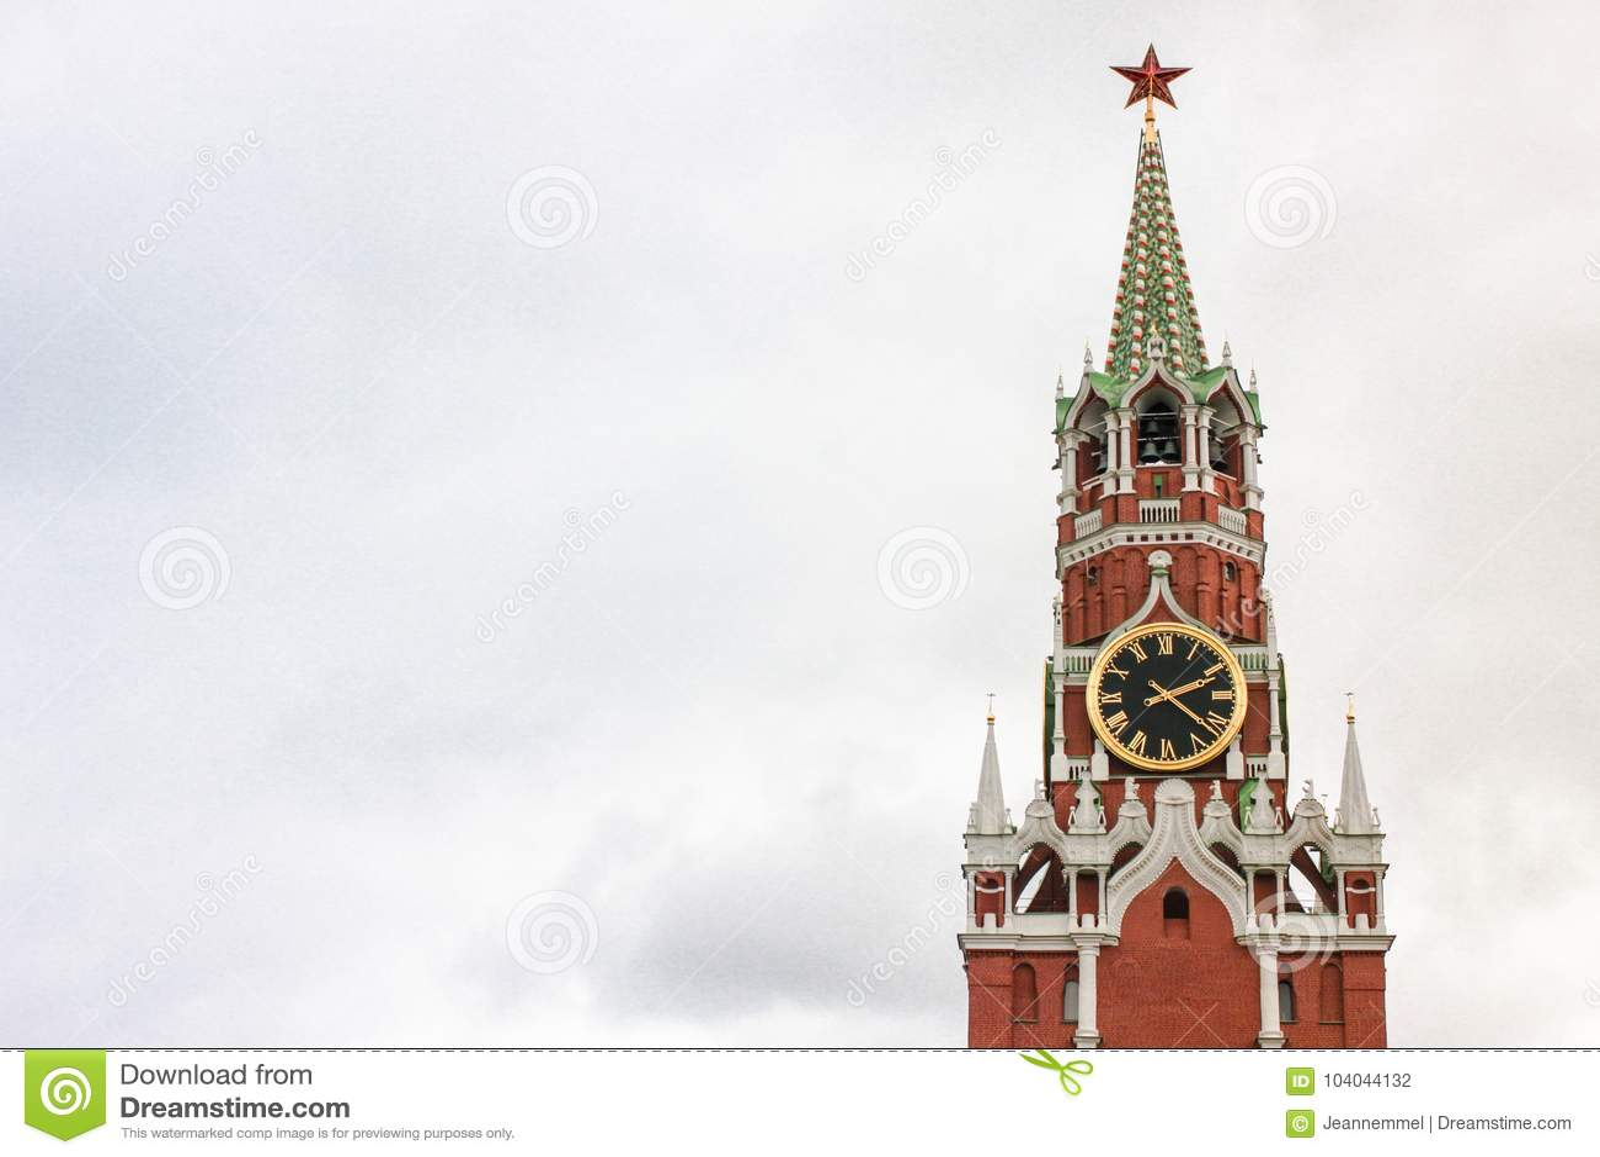 Spasskaya Tower of the Moscow Kremlin against the white sky